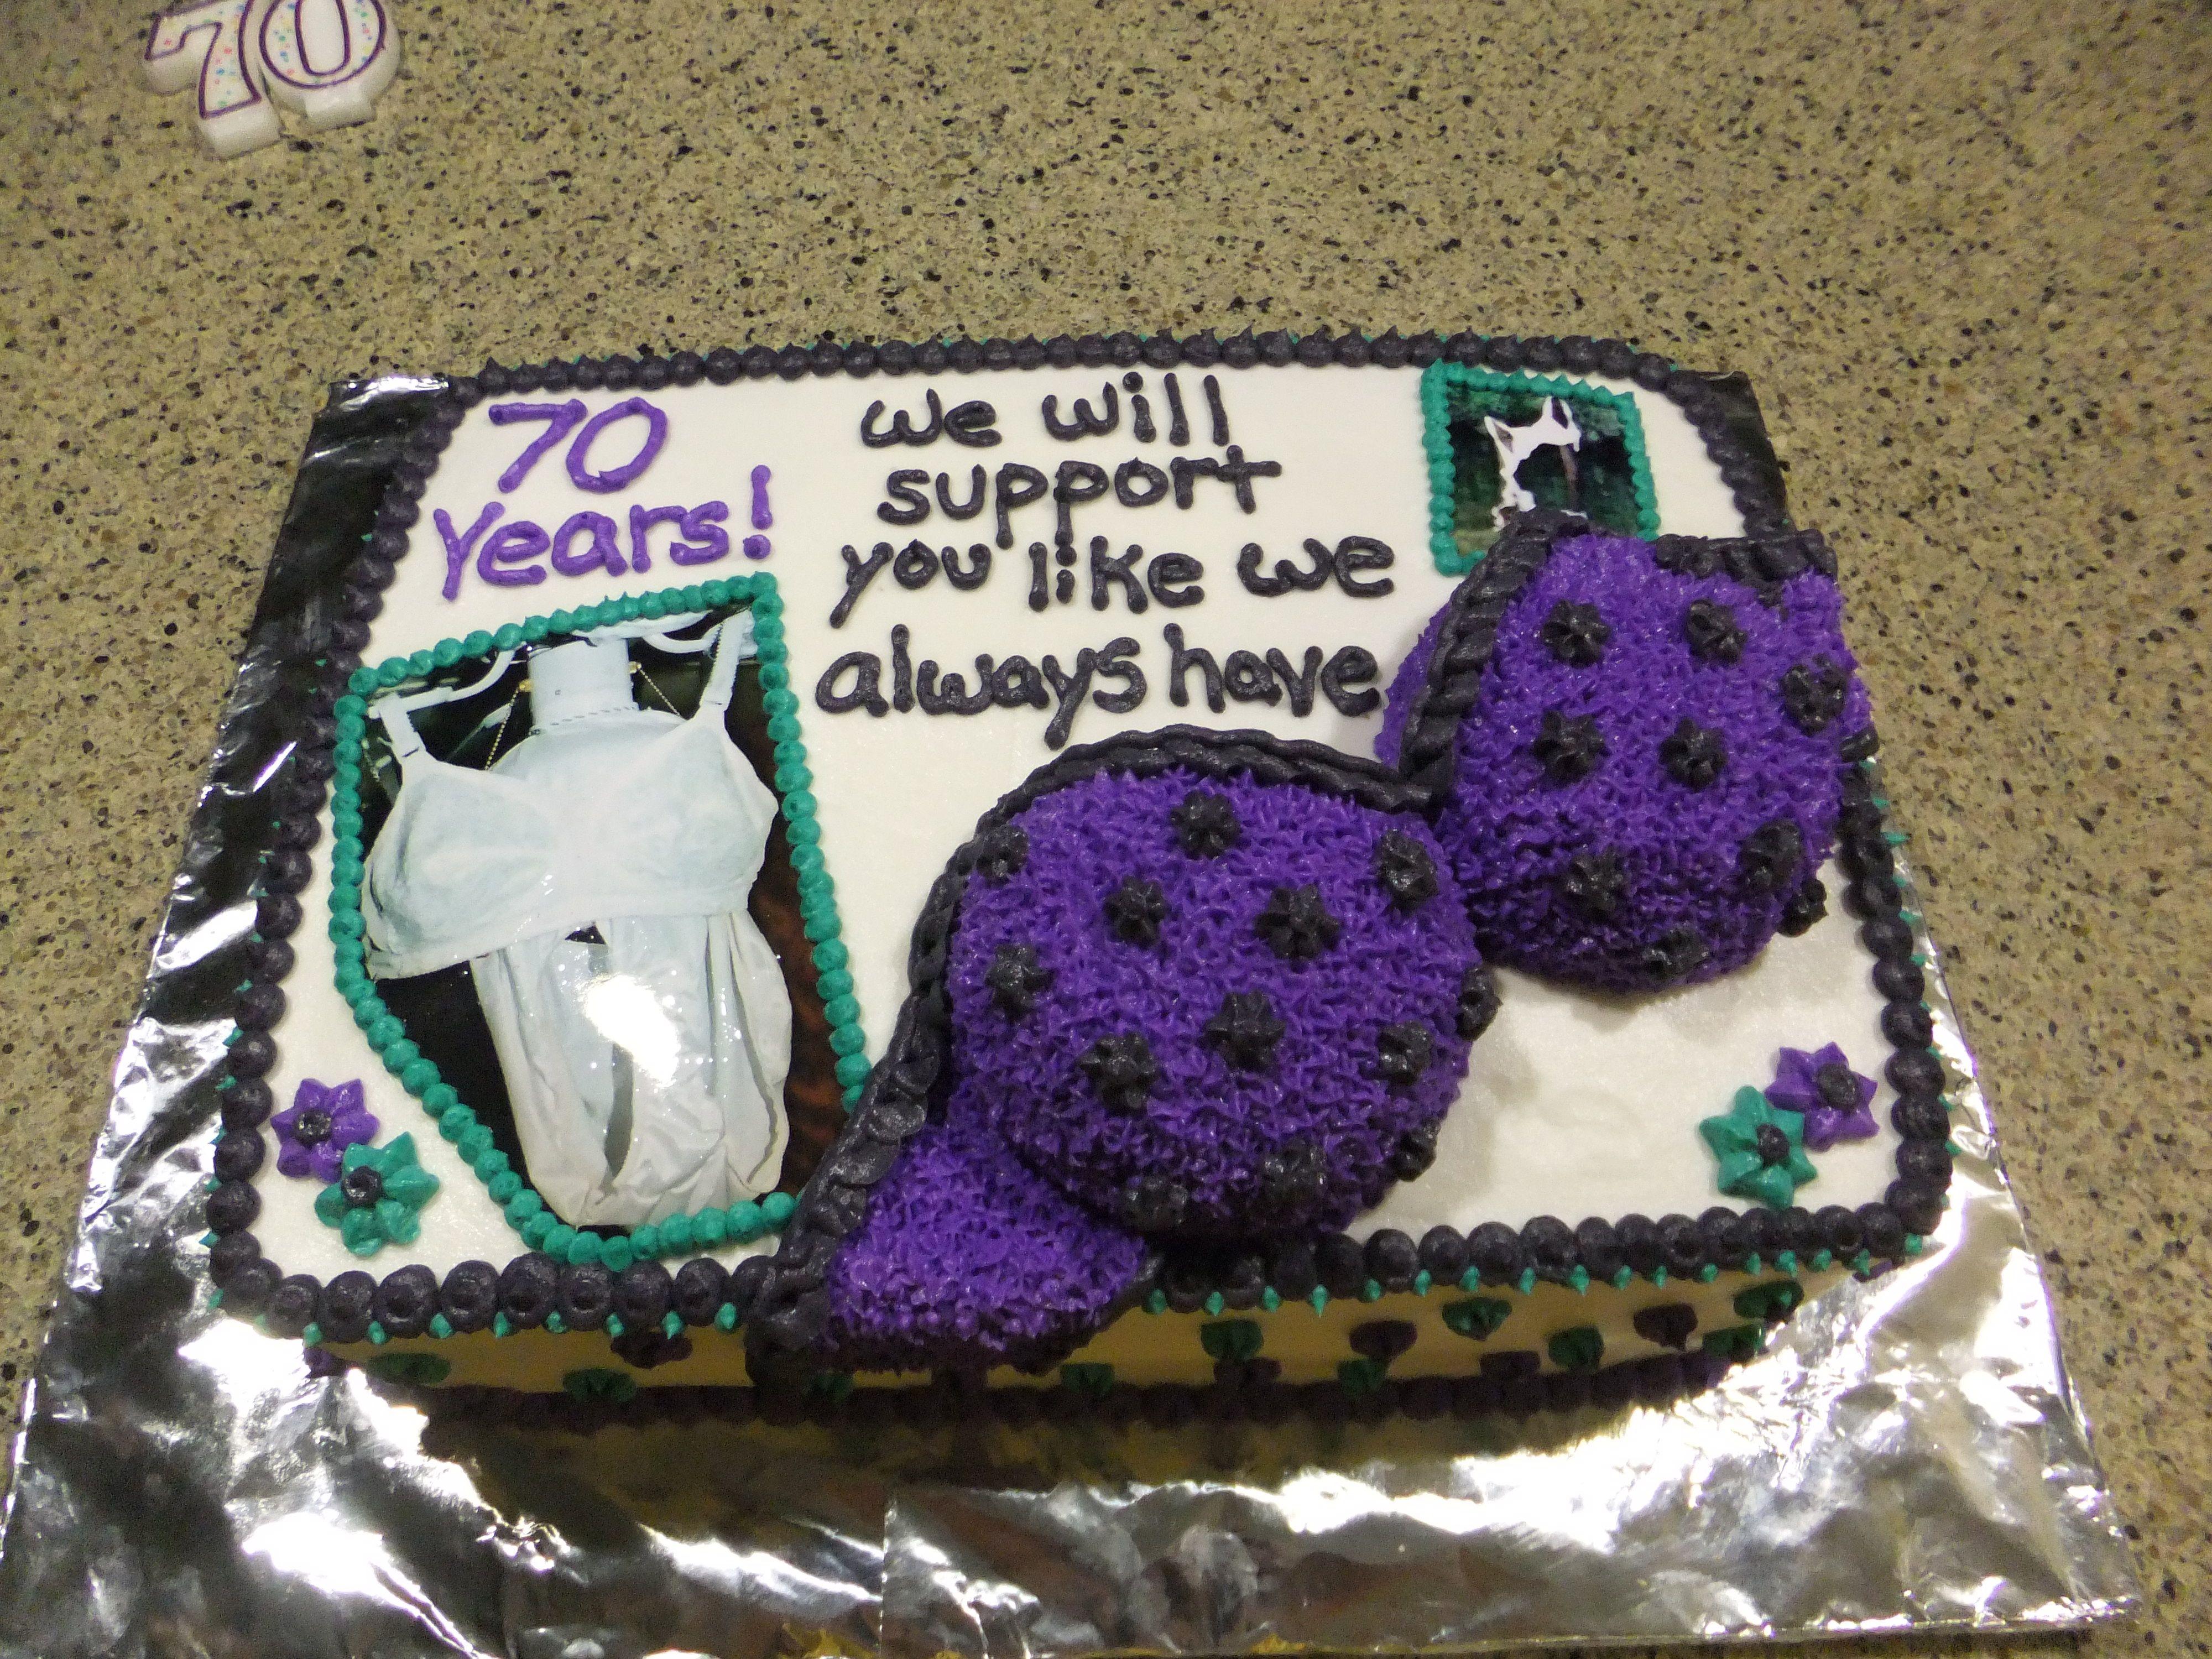 70th birthday Bra cake for Grandma Cakes I have made Pinterest